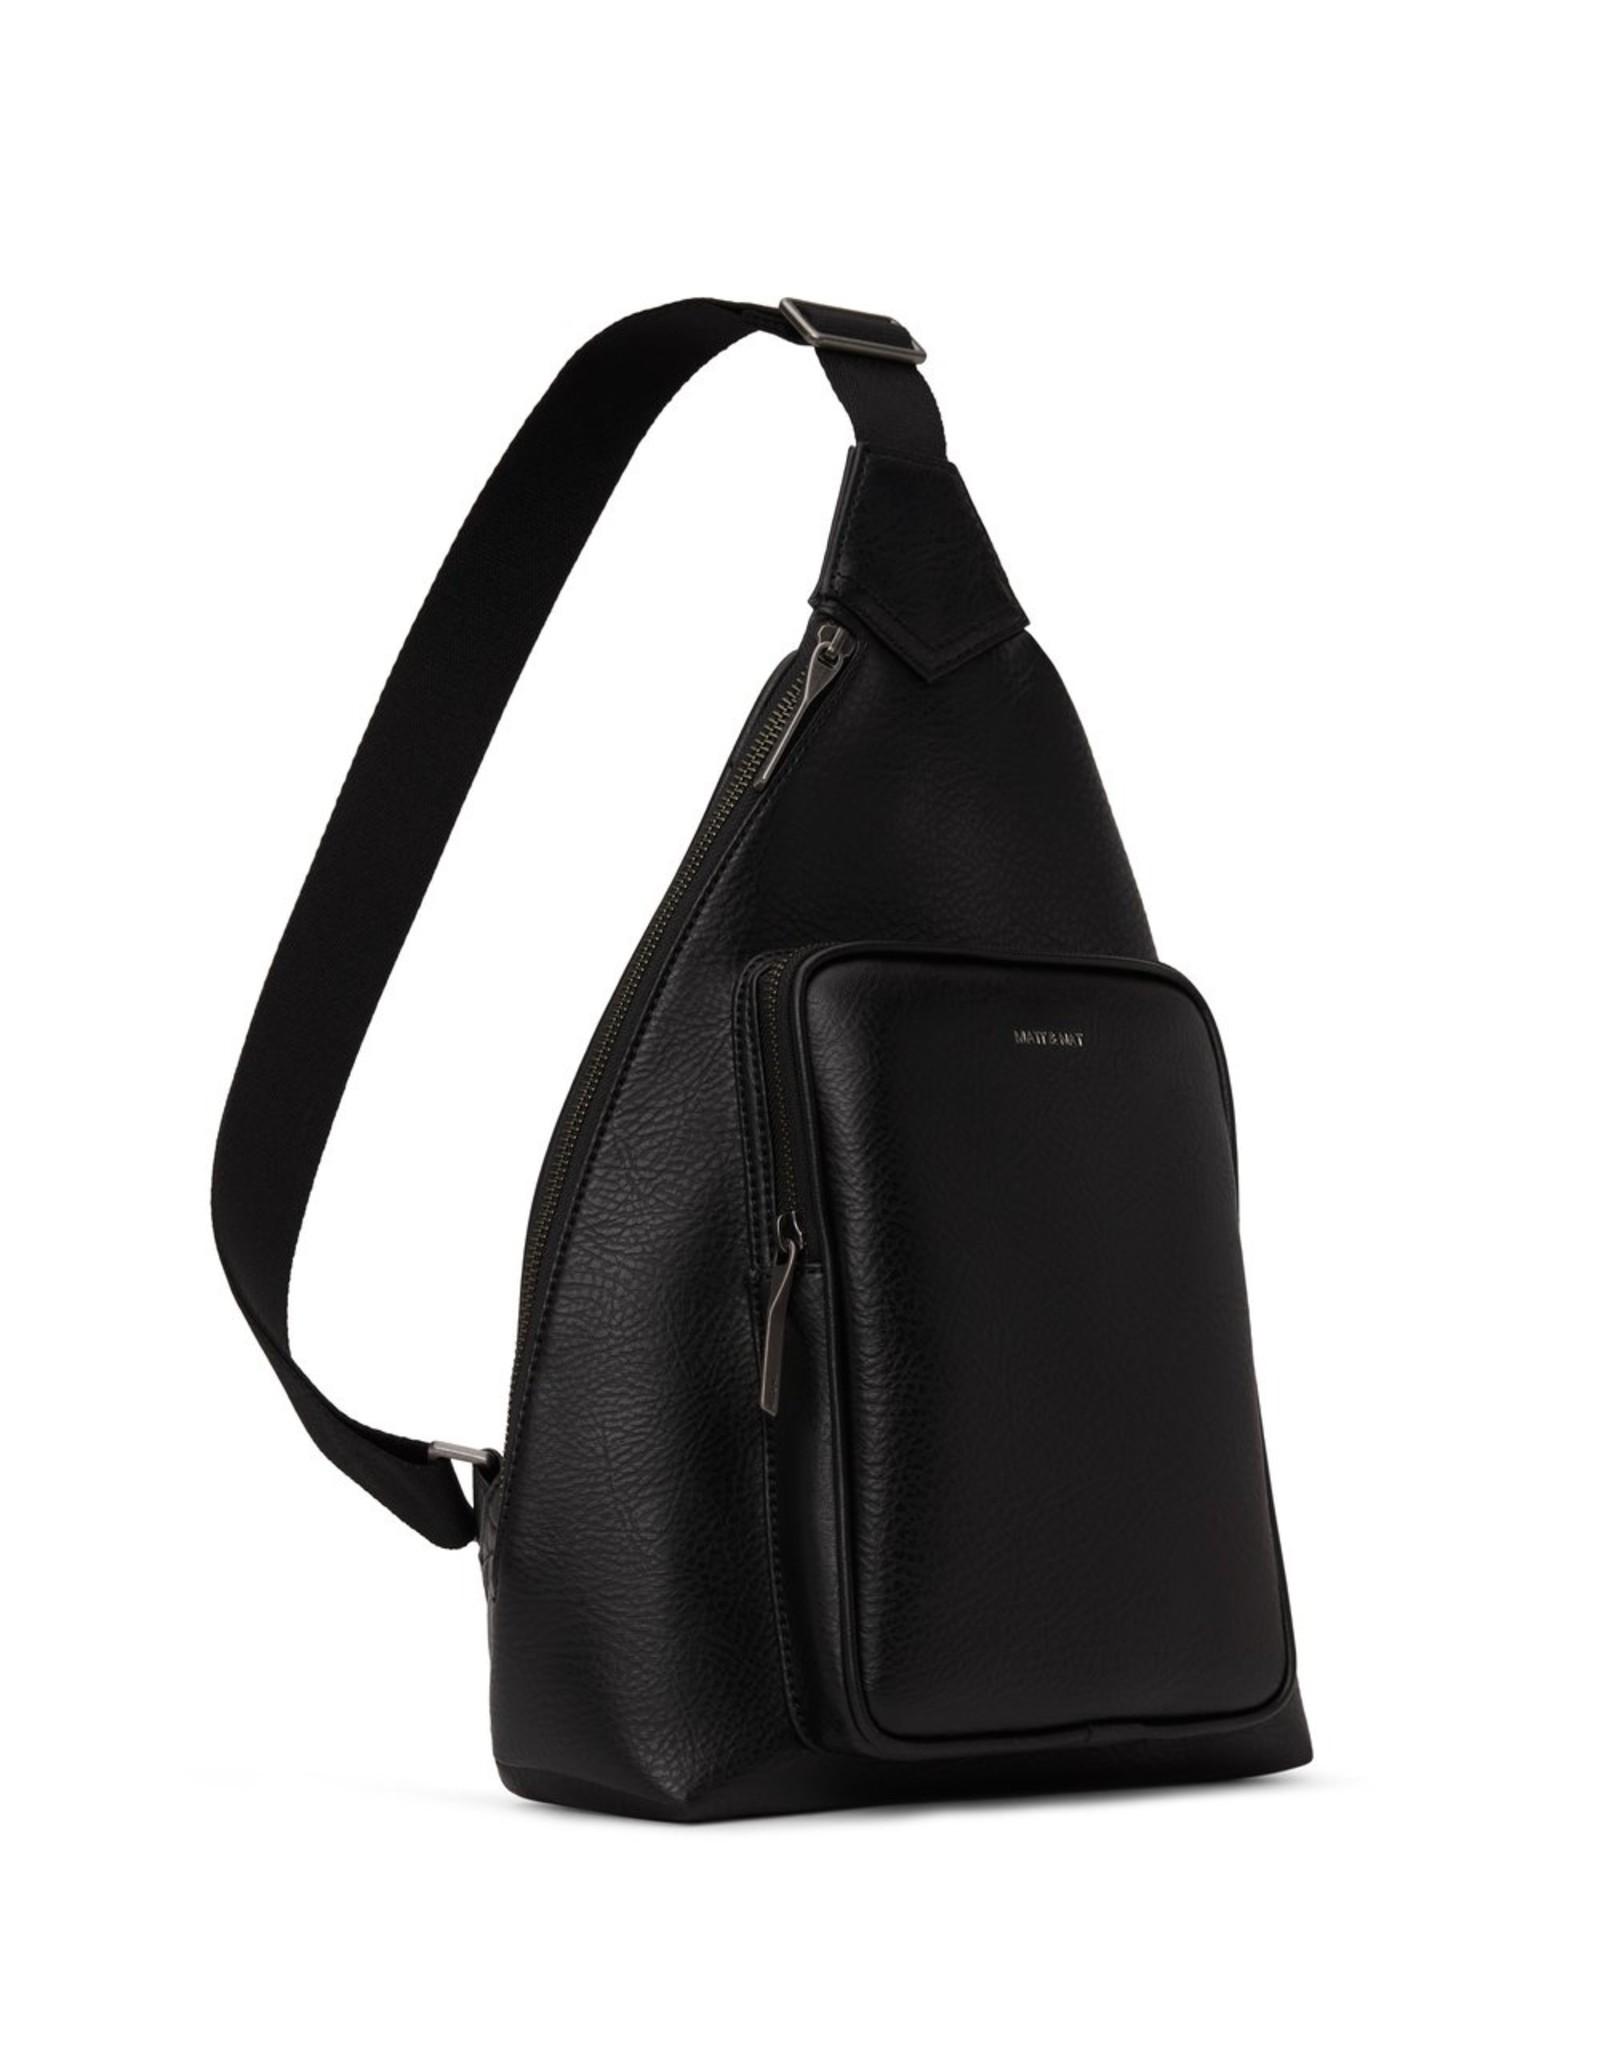 Dwell Backpack, Orv/Black